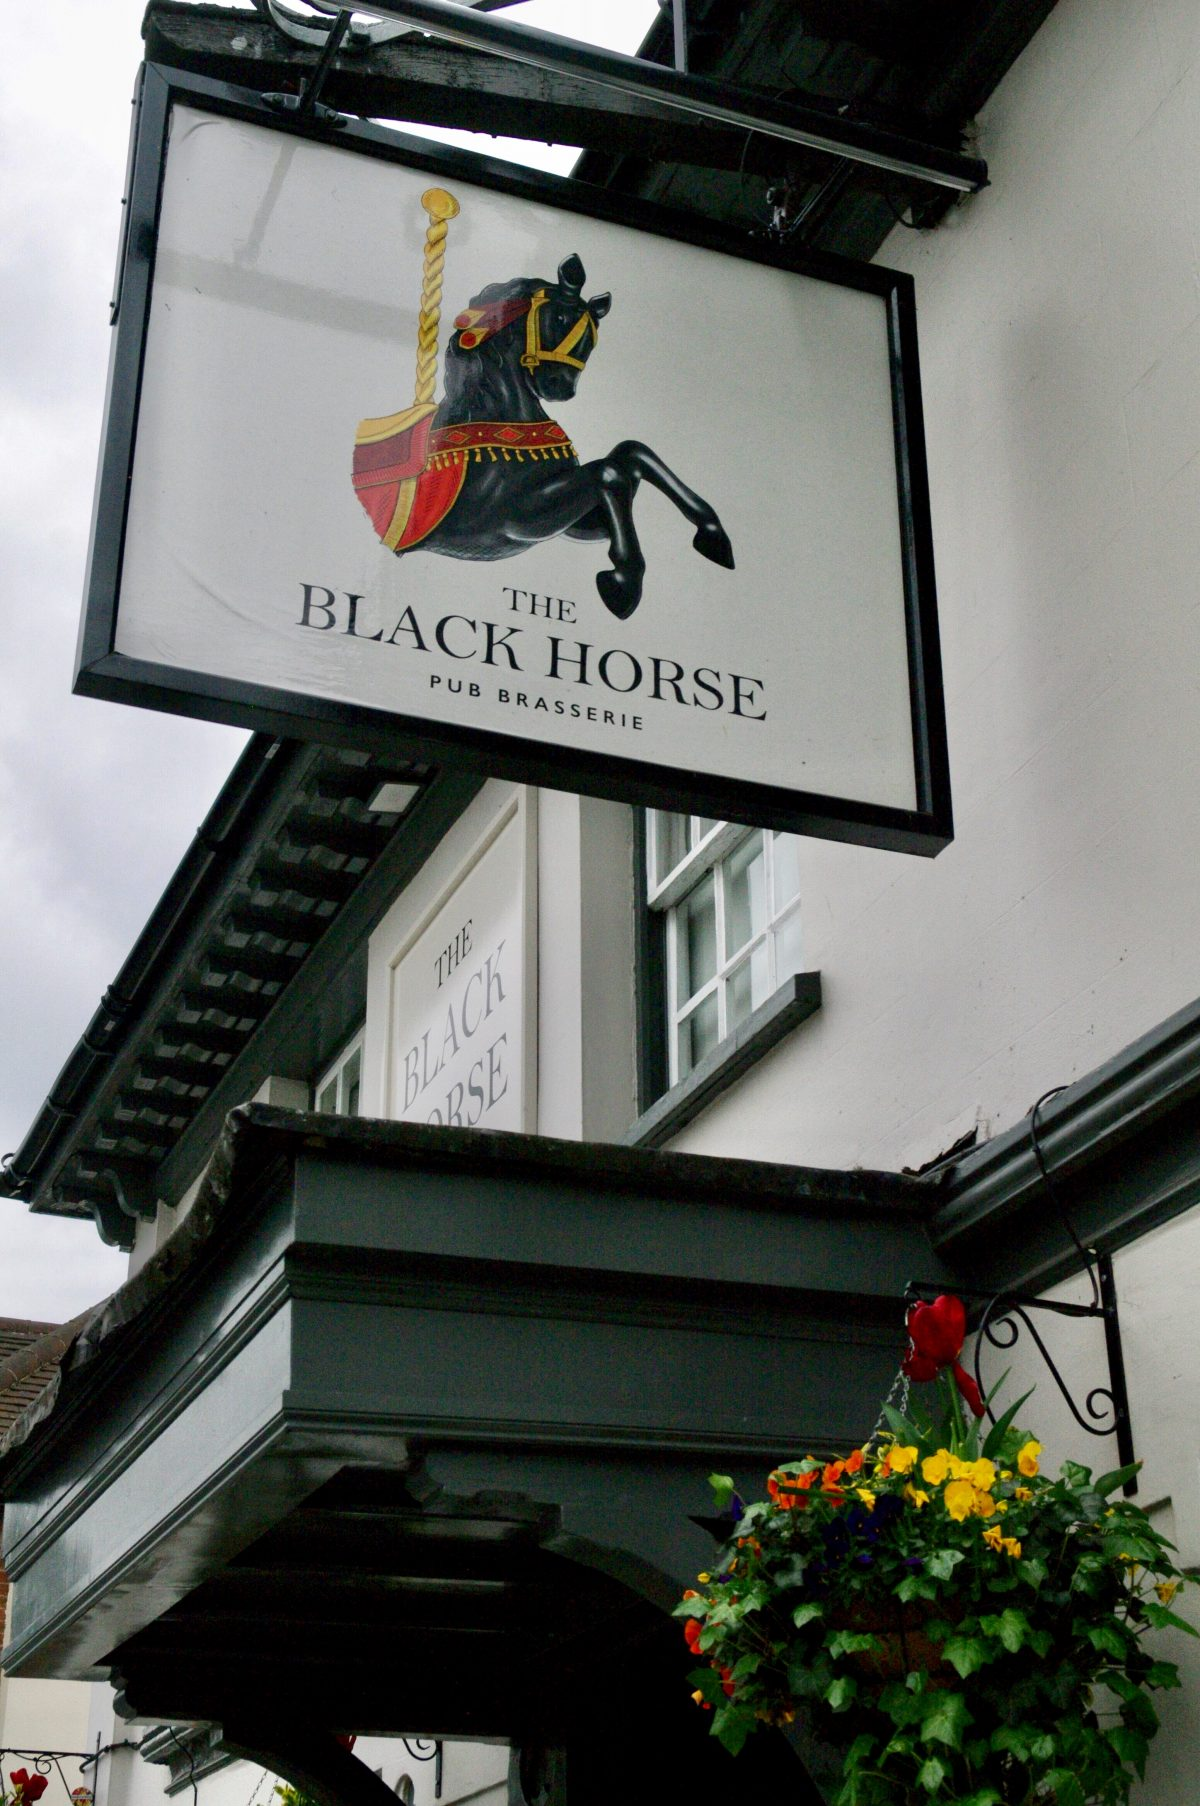 The Black Horse Thame, Oxfordshire | Bitten Oxford